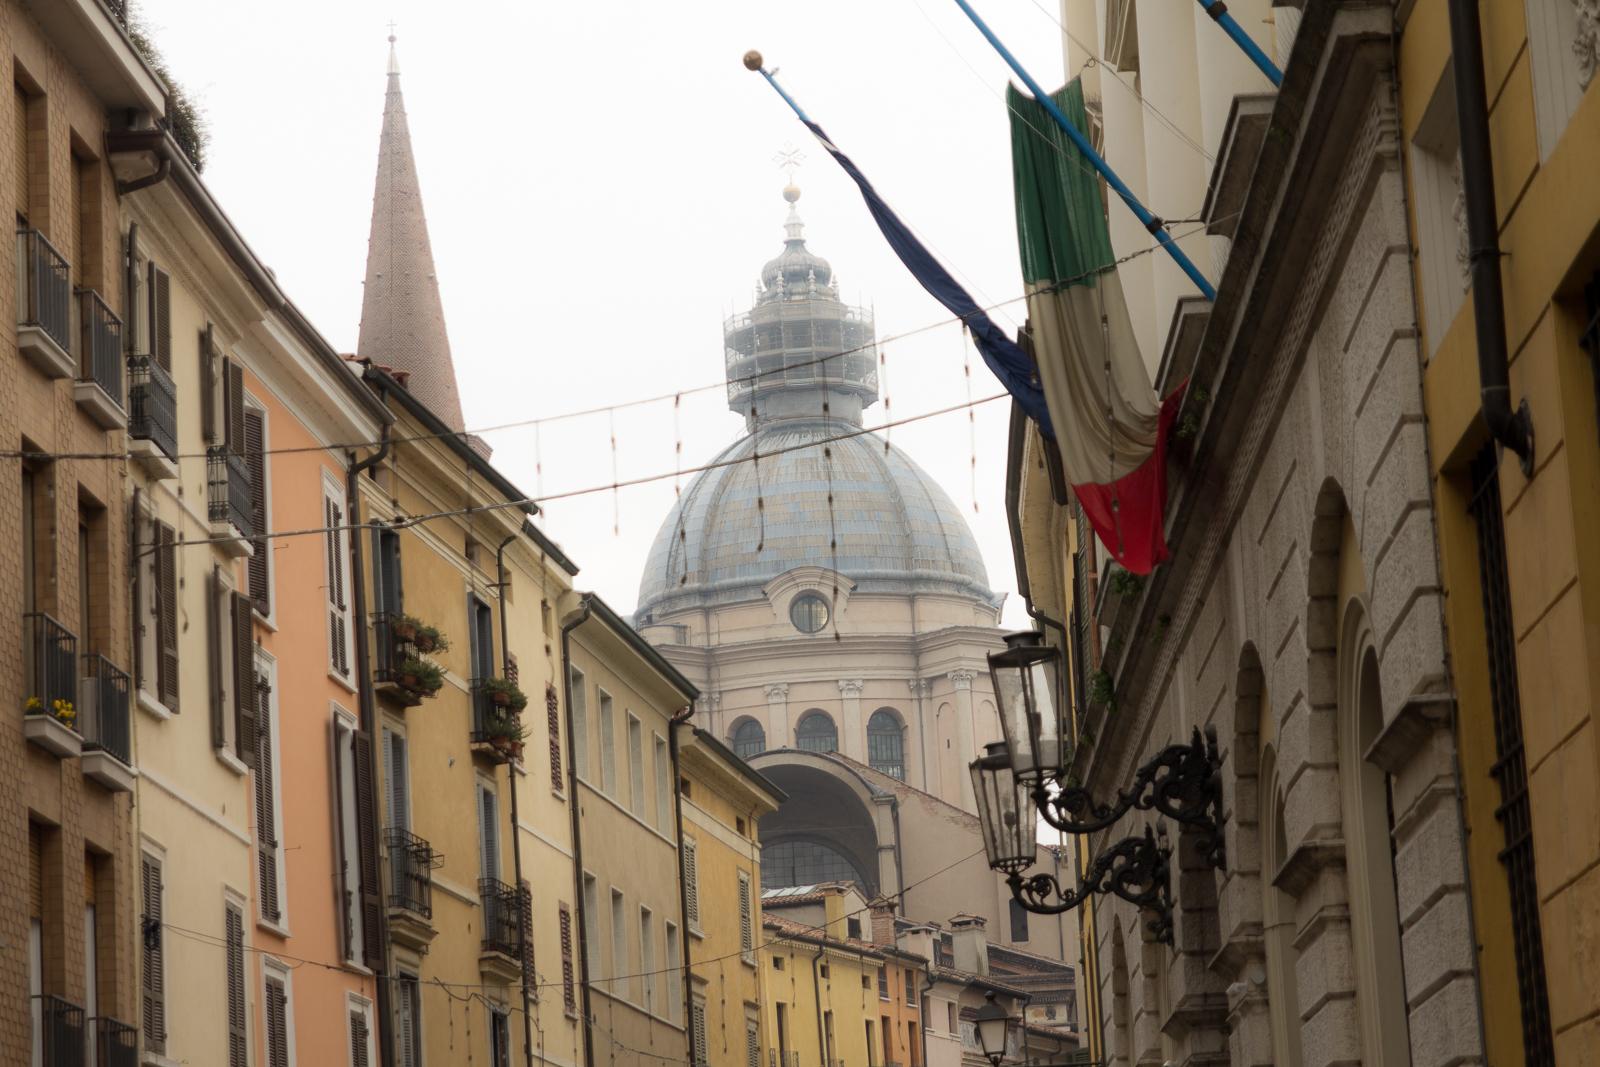 Cupola of Basilica di Sant'Andrea, Mantua street view